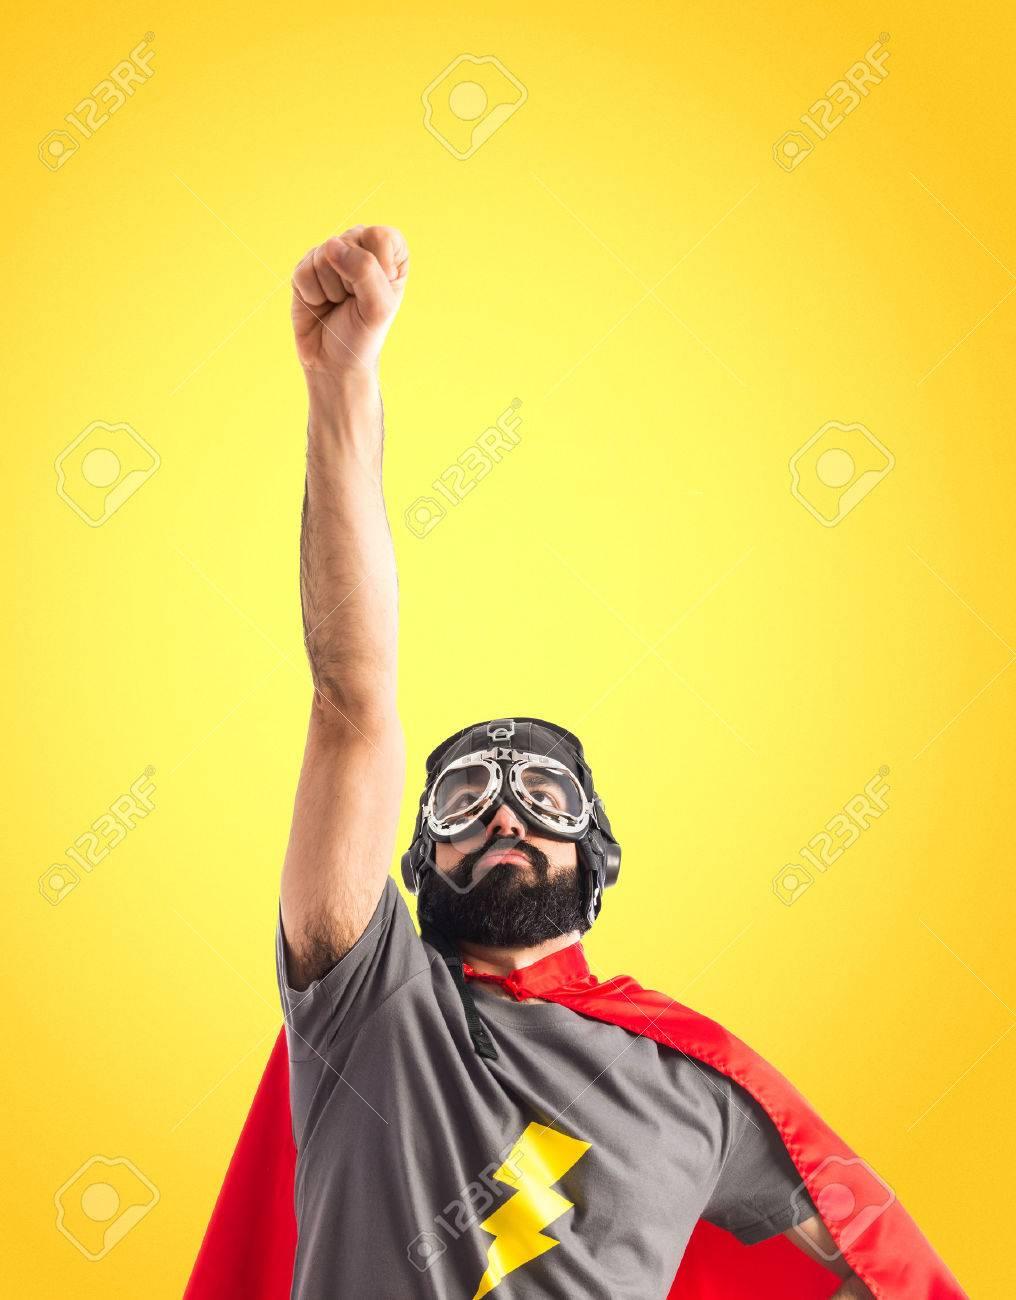 Superhero doing fly gesture - 41310168